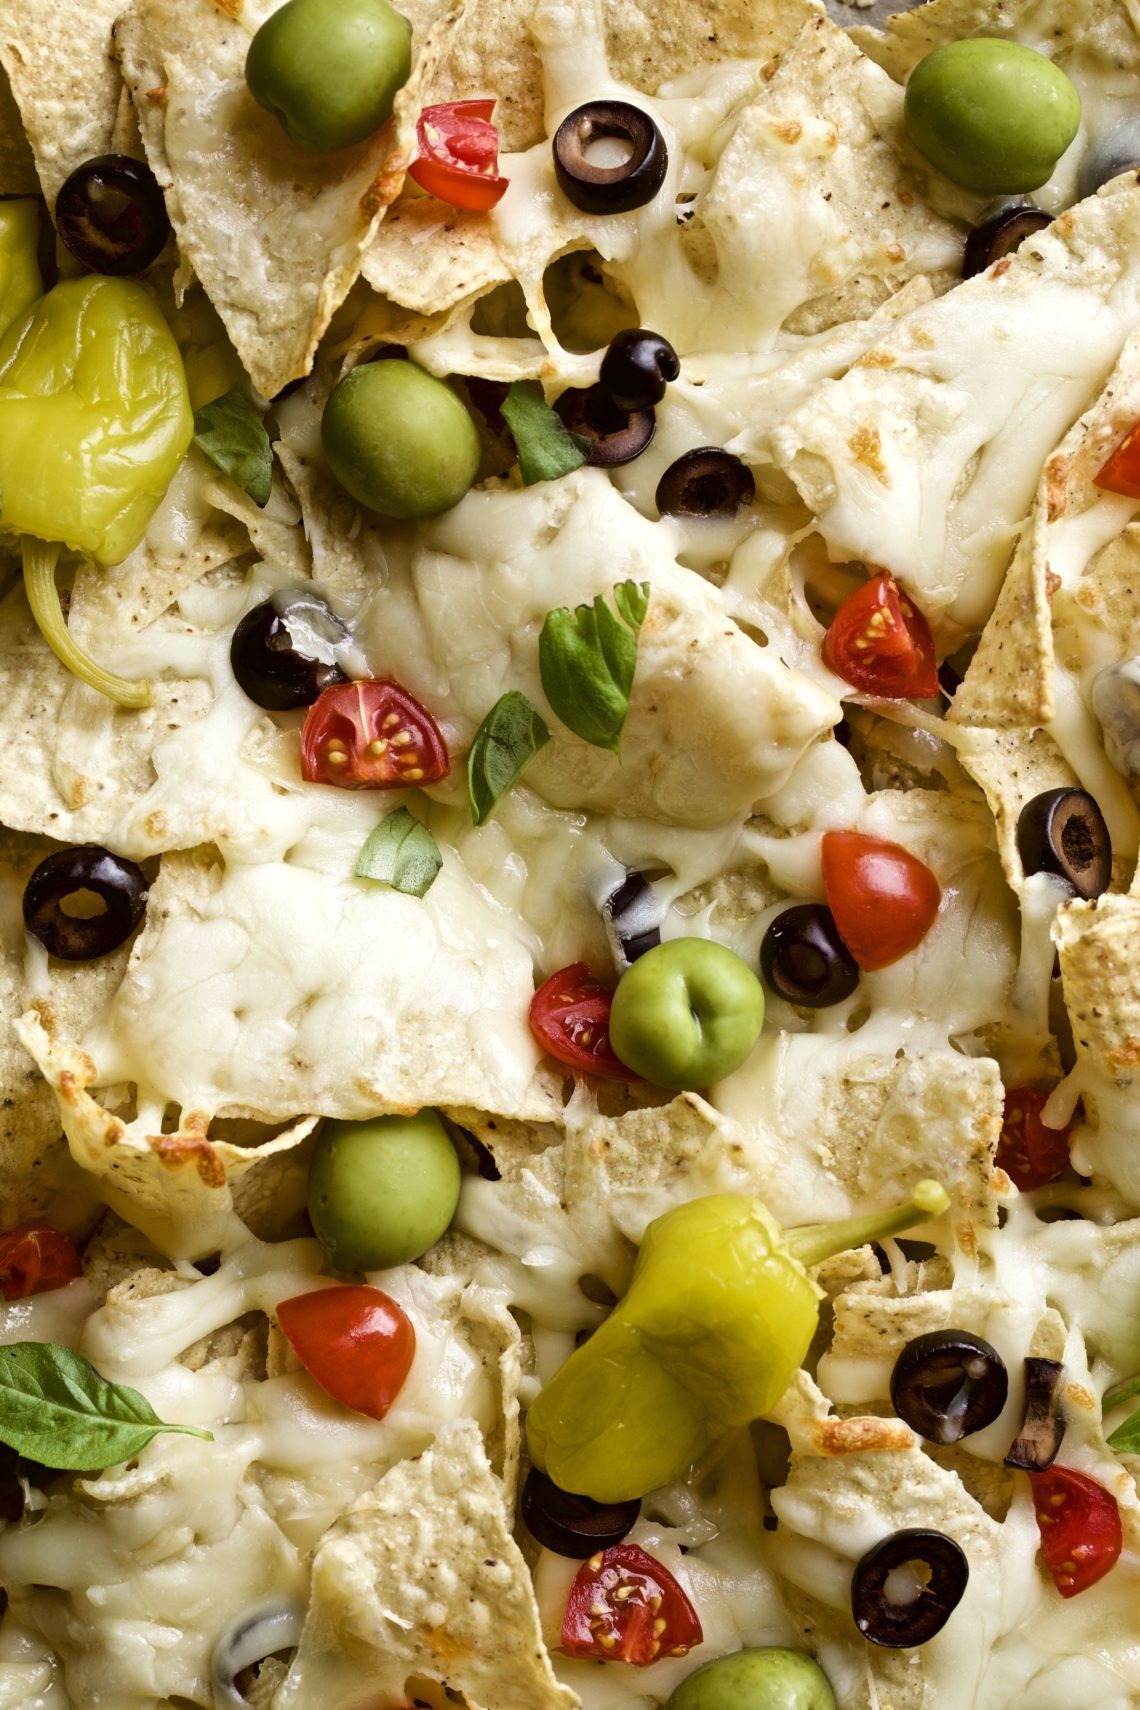 Italian nachos with dipping sauce